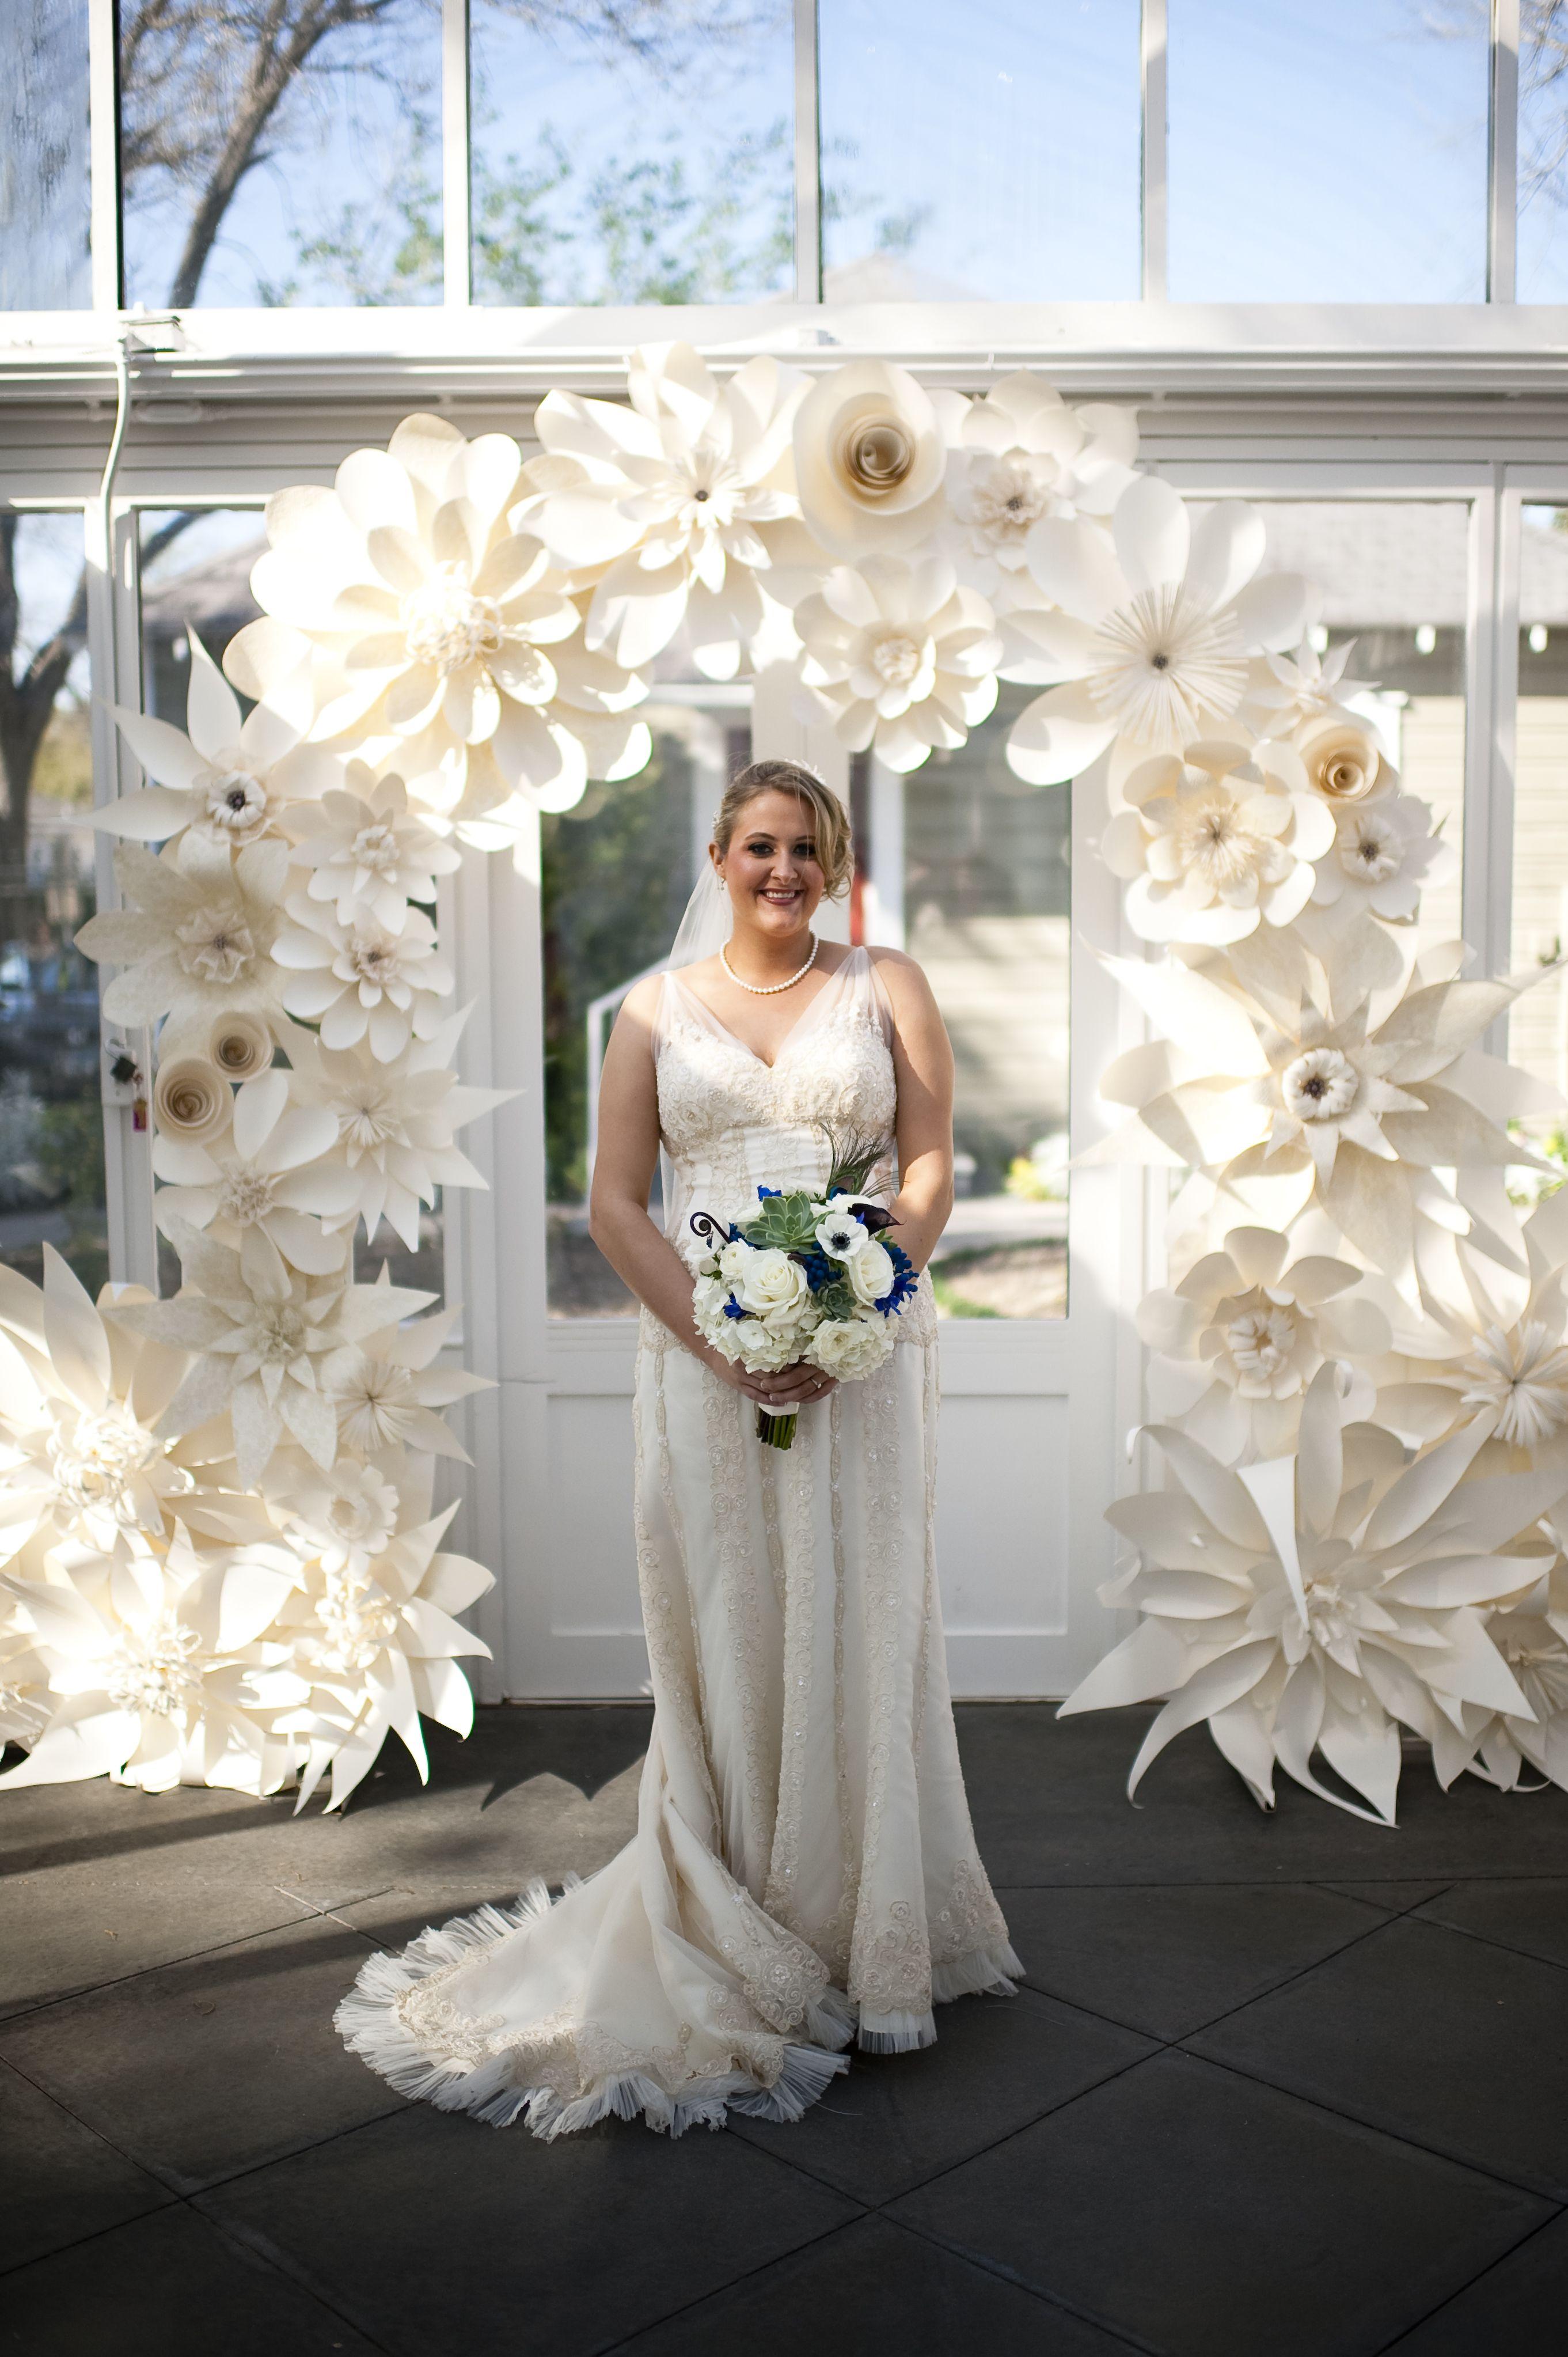 arche de fleur d coration mariage en 2019 id es de. Black Bedroom Furniture Sets. Home Design Ideas